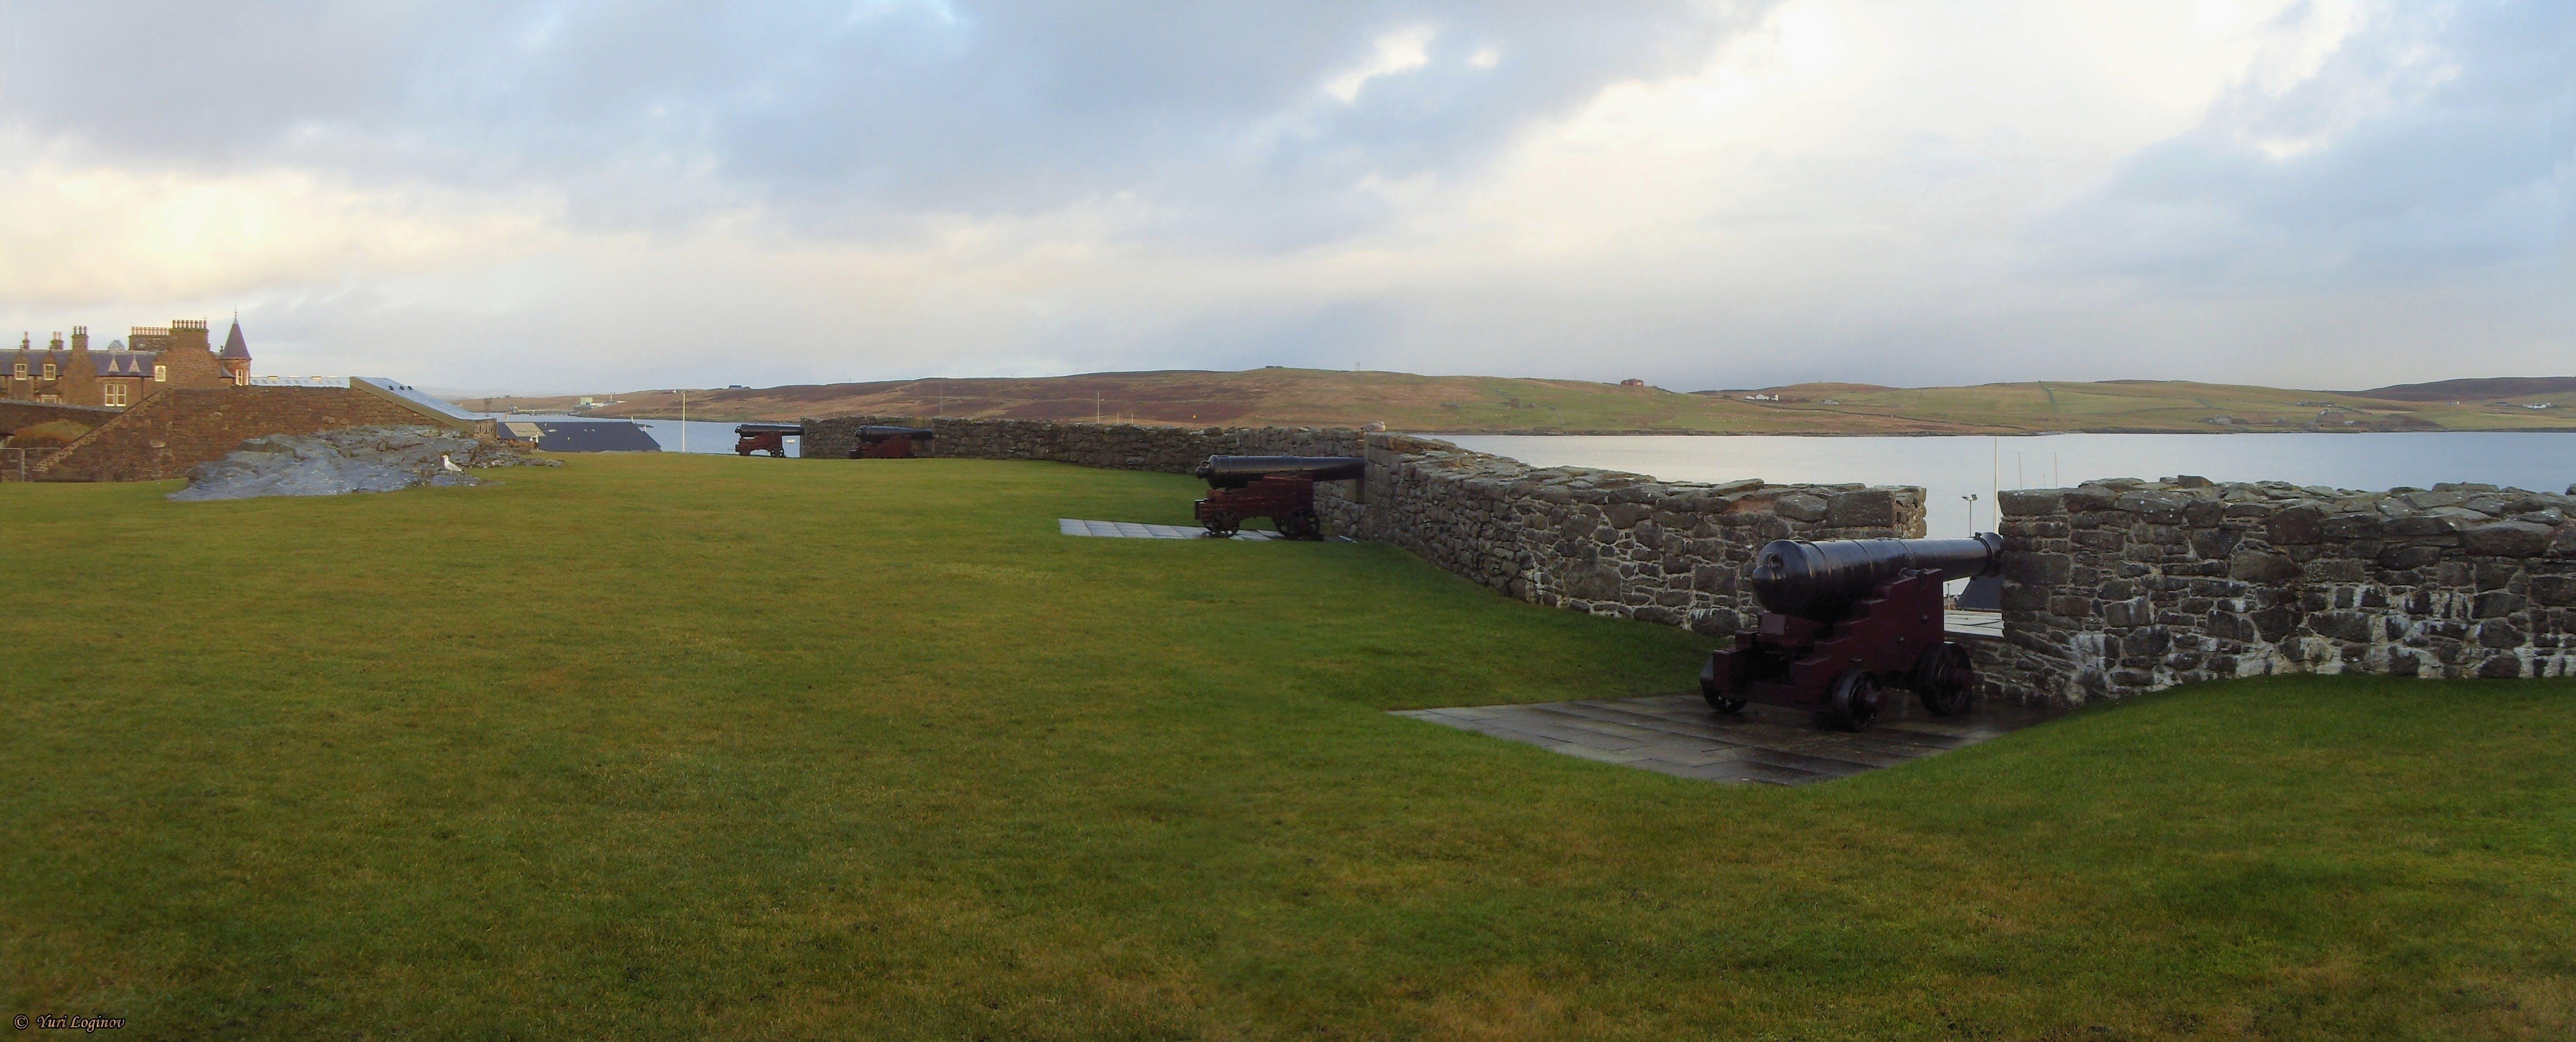 Free stock photo of scotland, united kingdom, Lerwick, Shetland